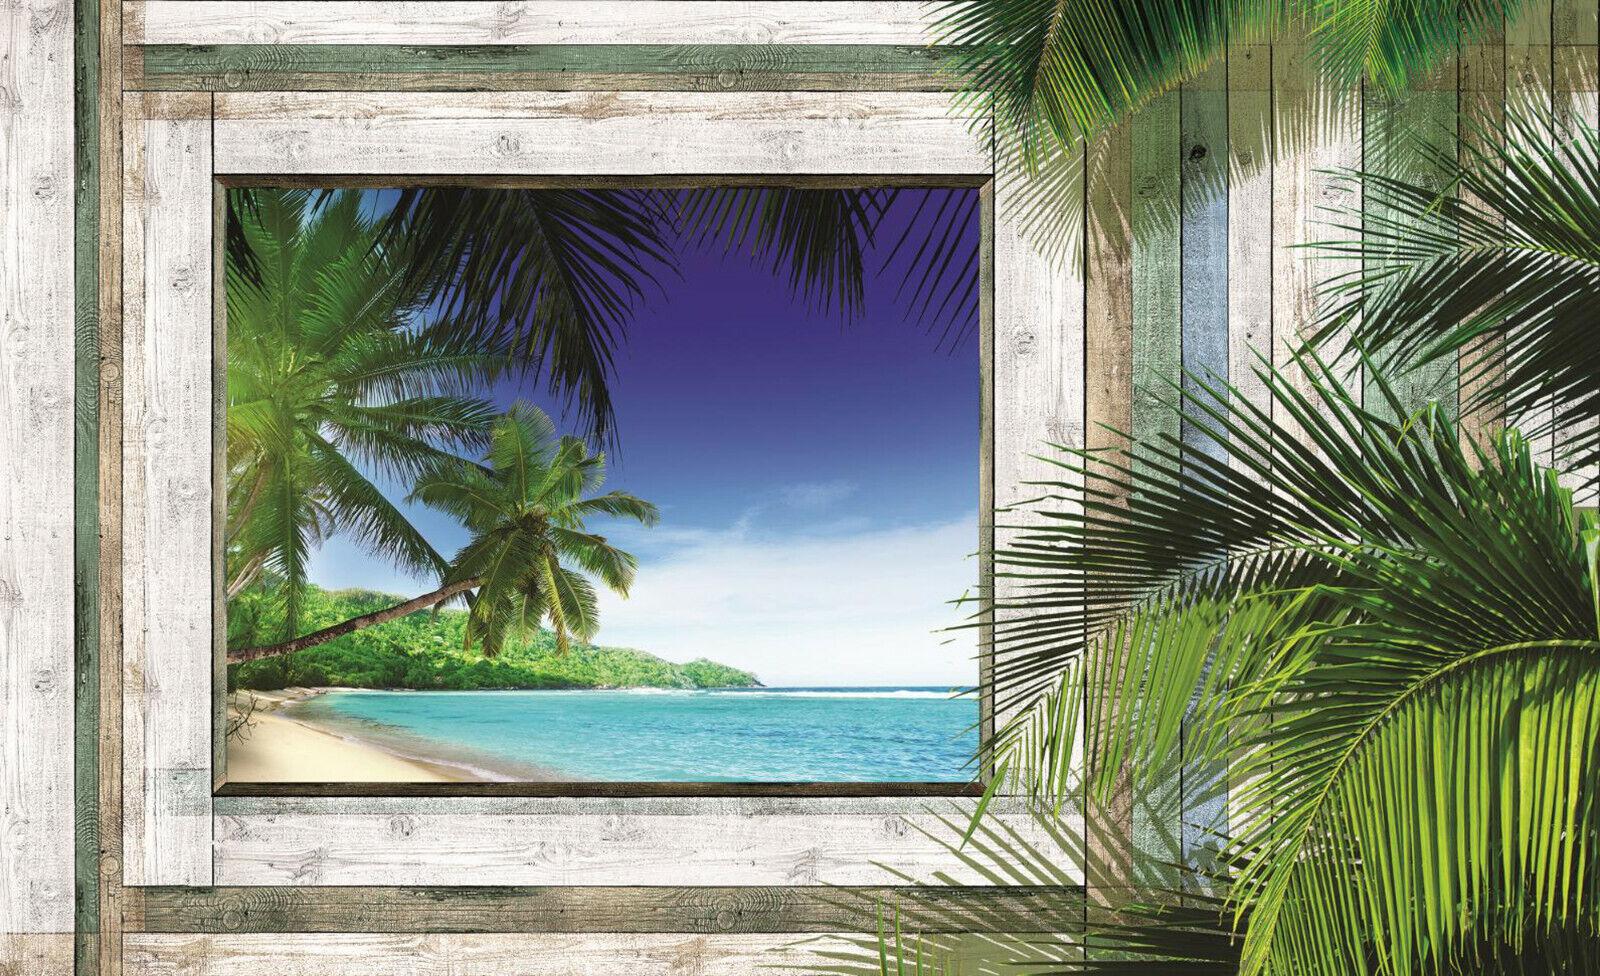 VLIES Fototapete-HOLZ-WAND-(1223)-Palmen-Strand Karibik Südsee Meer Fenster